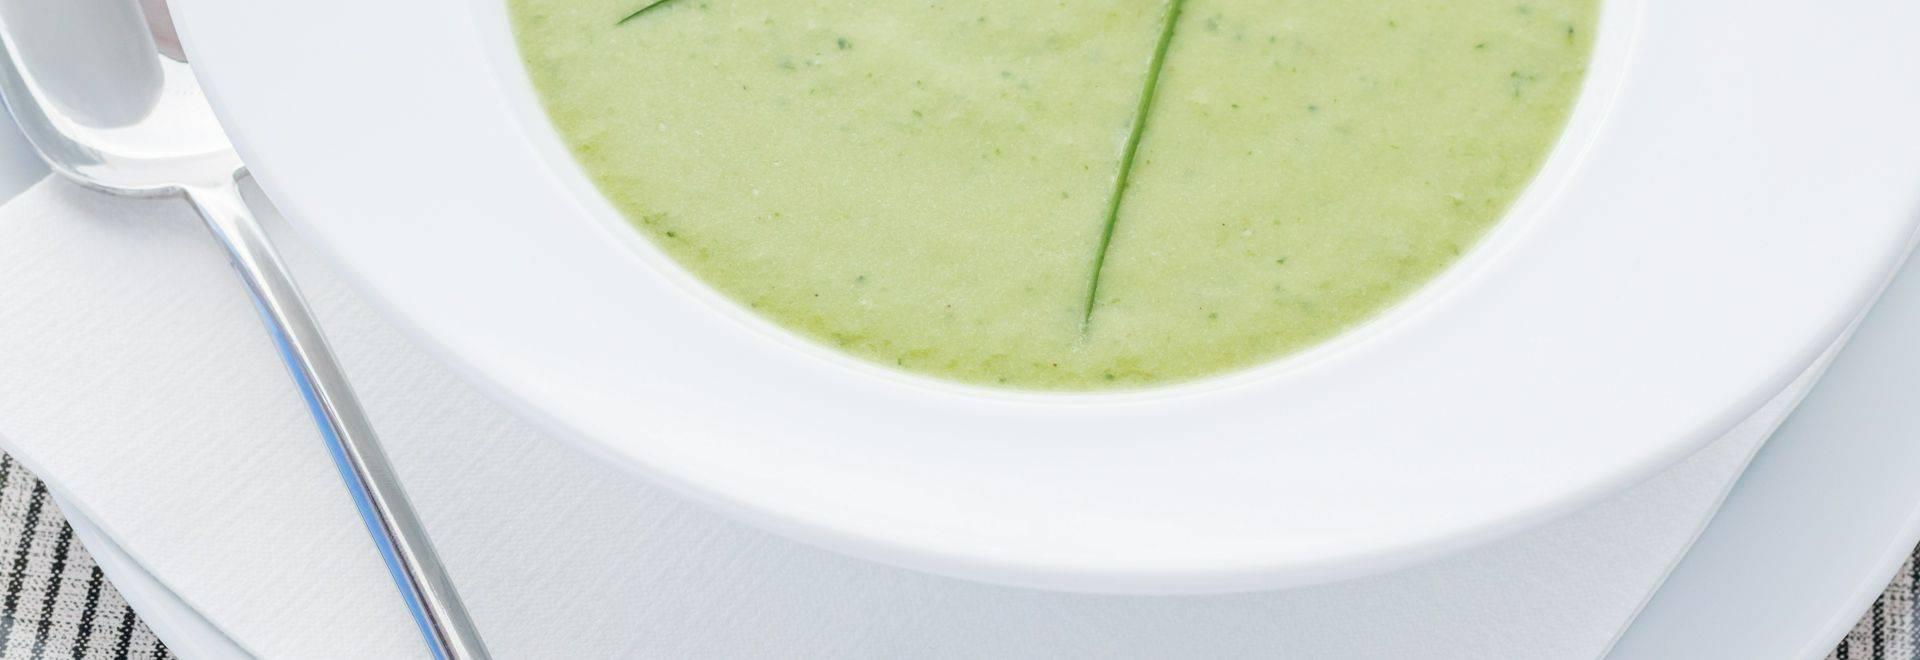 Longevity Cegonha Healthy Cuisine 1